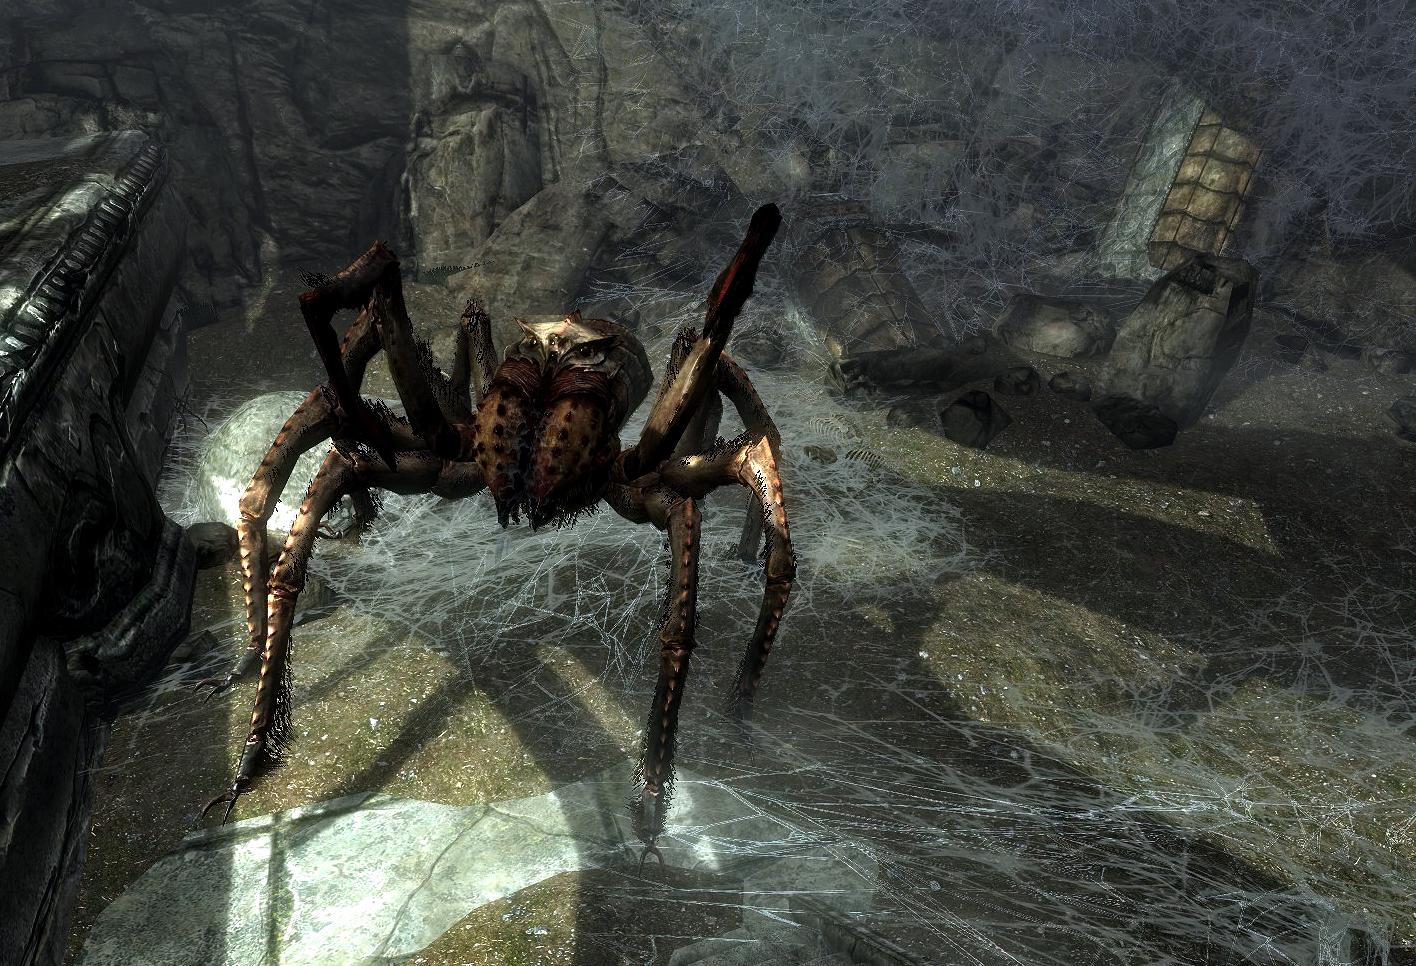 Nimhe, the Poisoned One | Elder Scrolls | FANDOM powered by